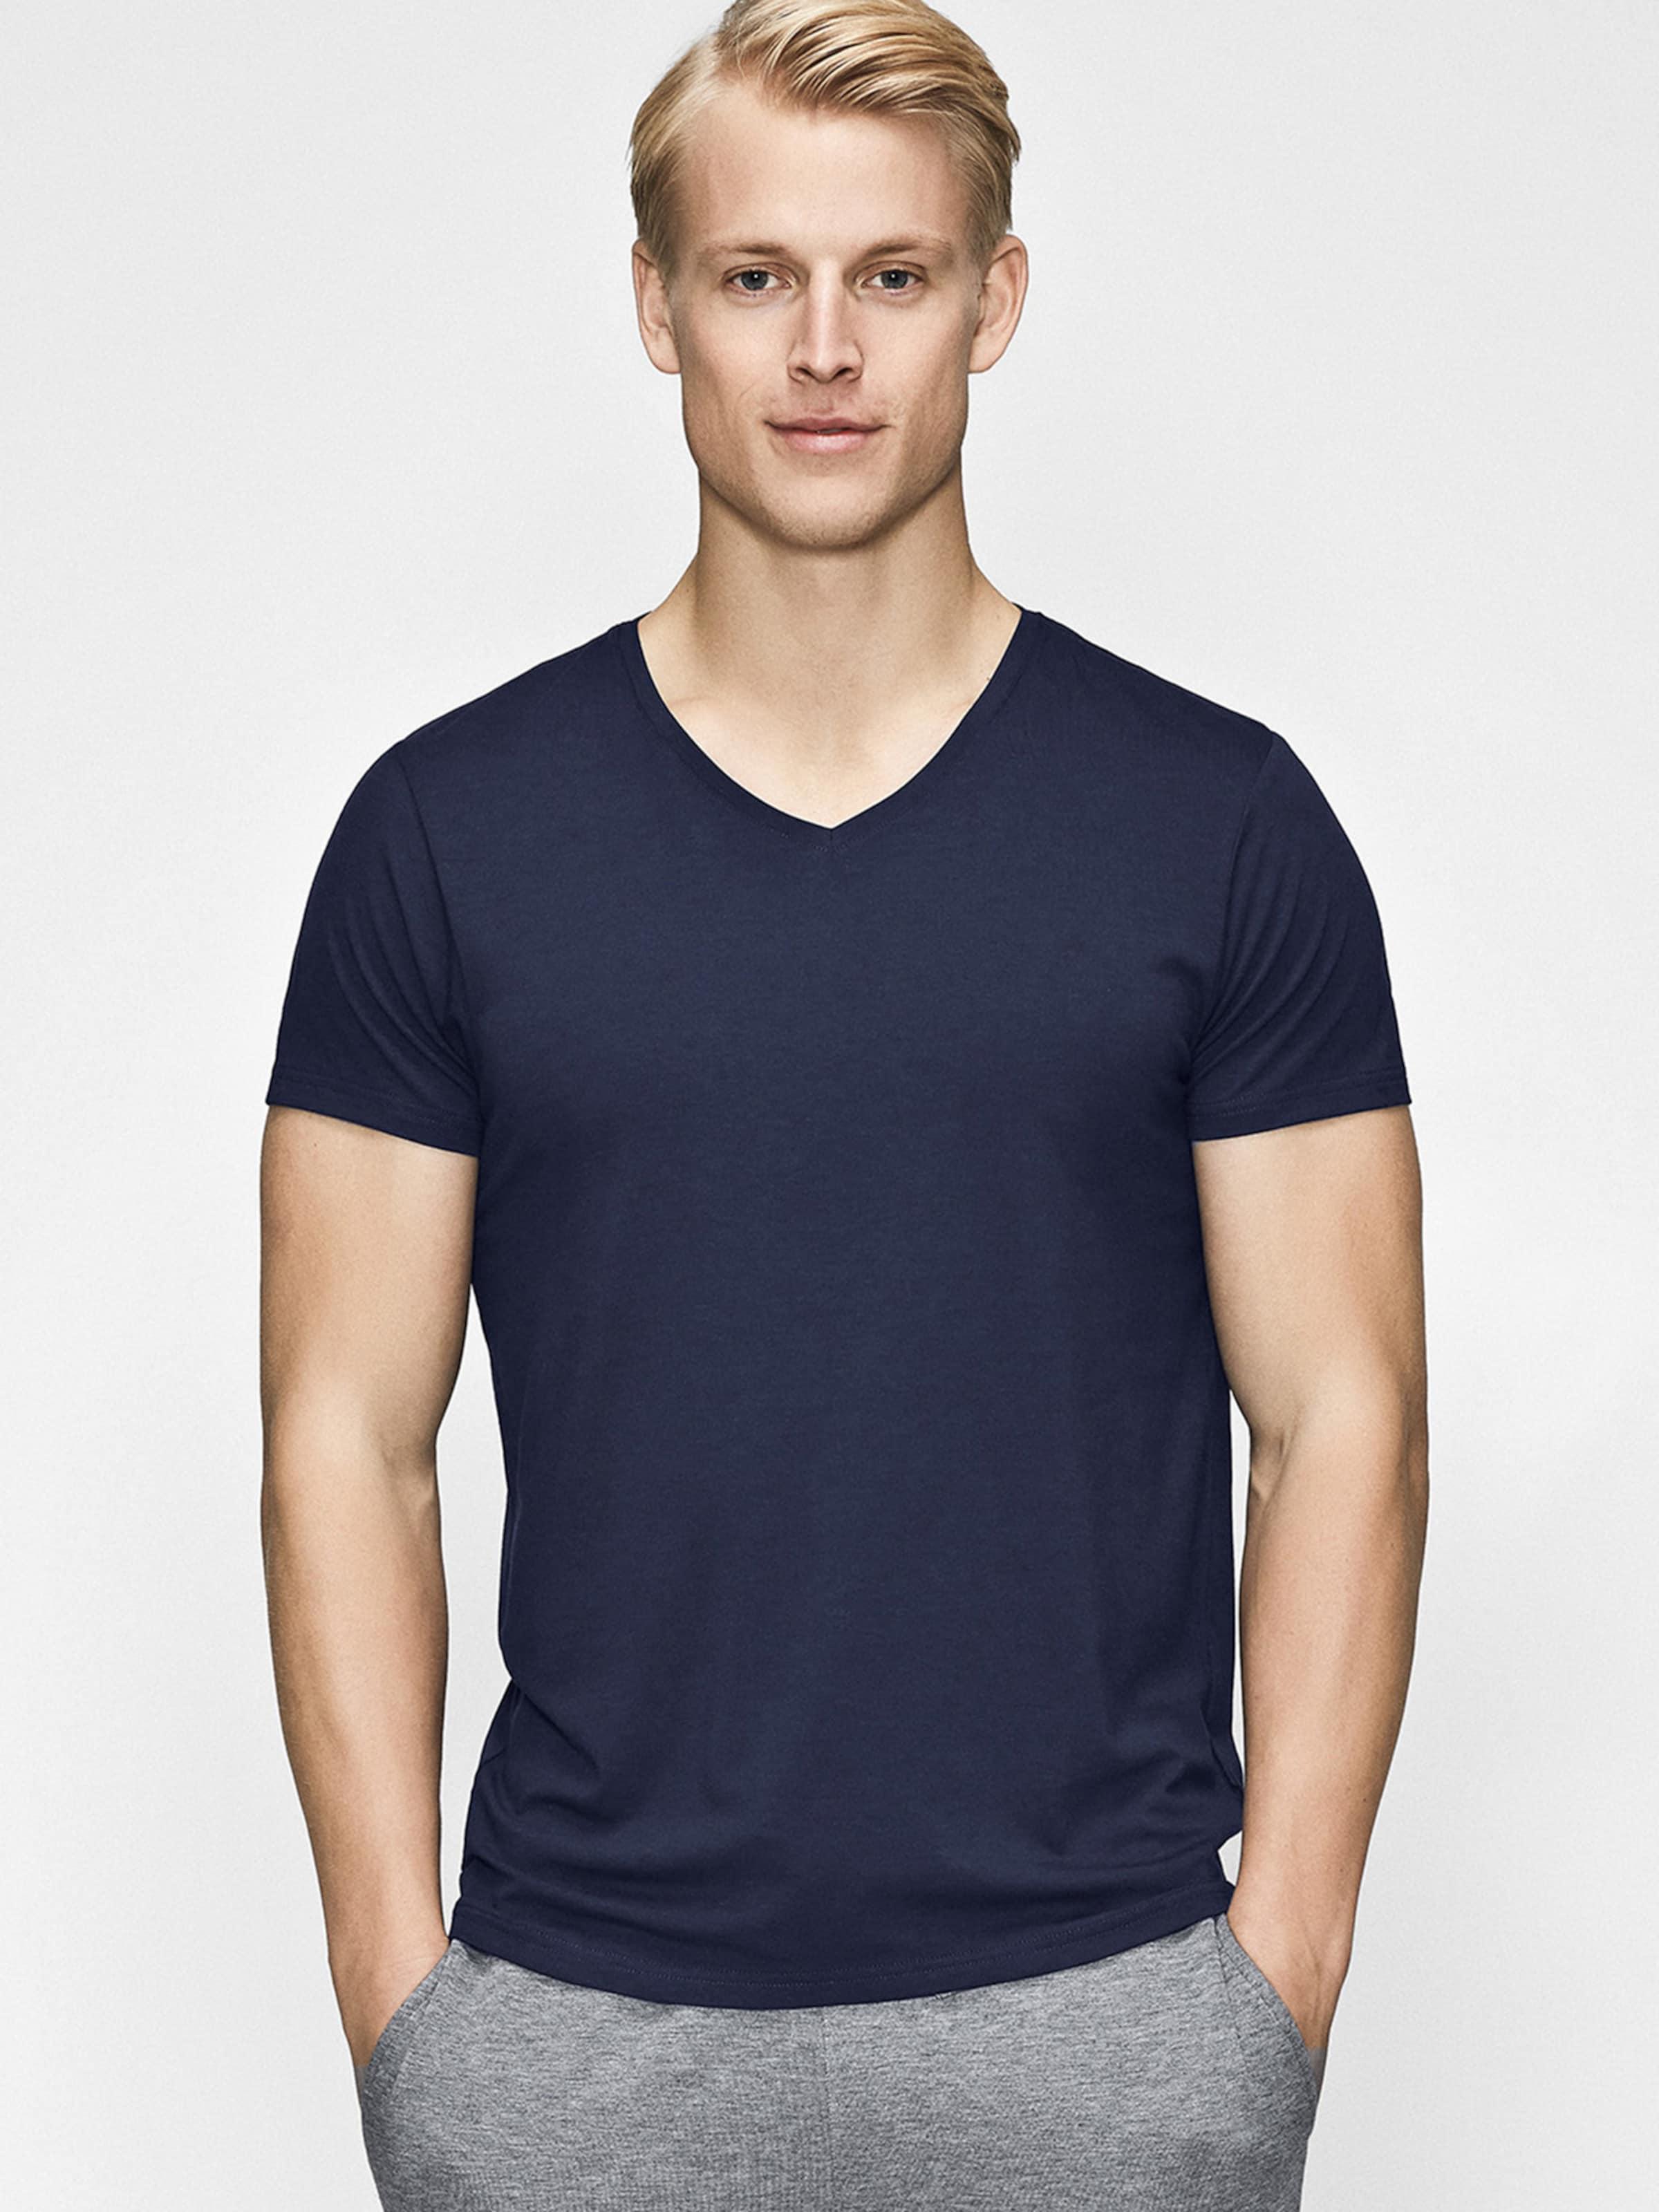 JBS OF DENMARK Unterhemd in dunkelblau Unifarben 8745